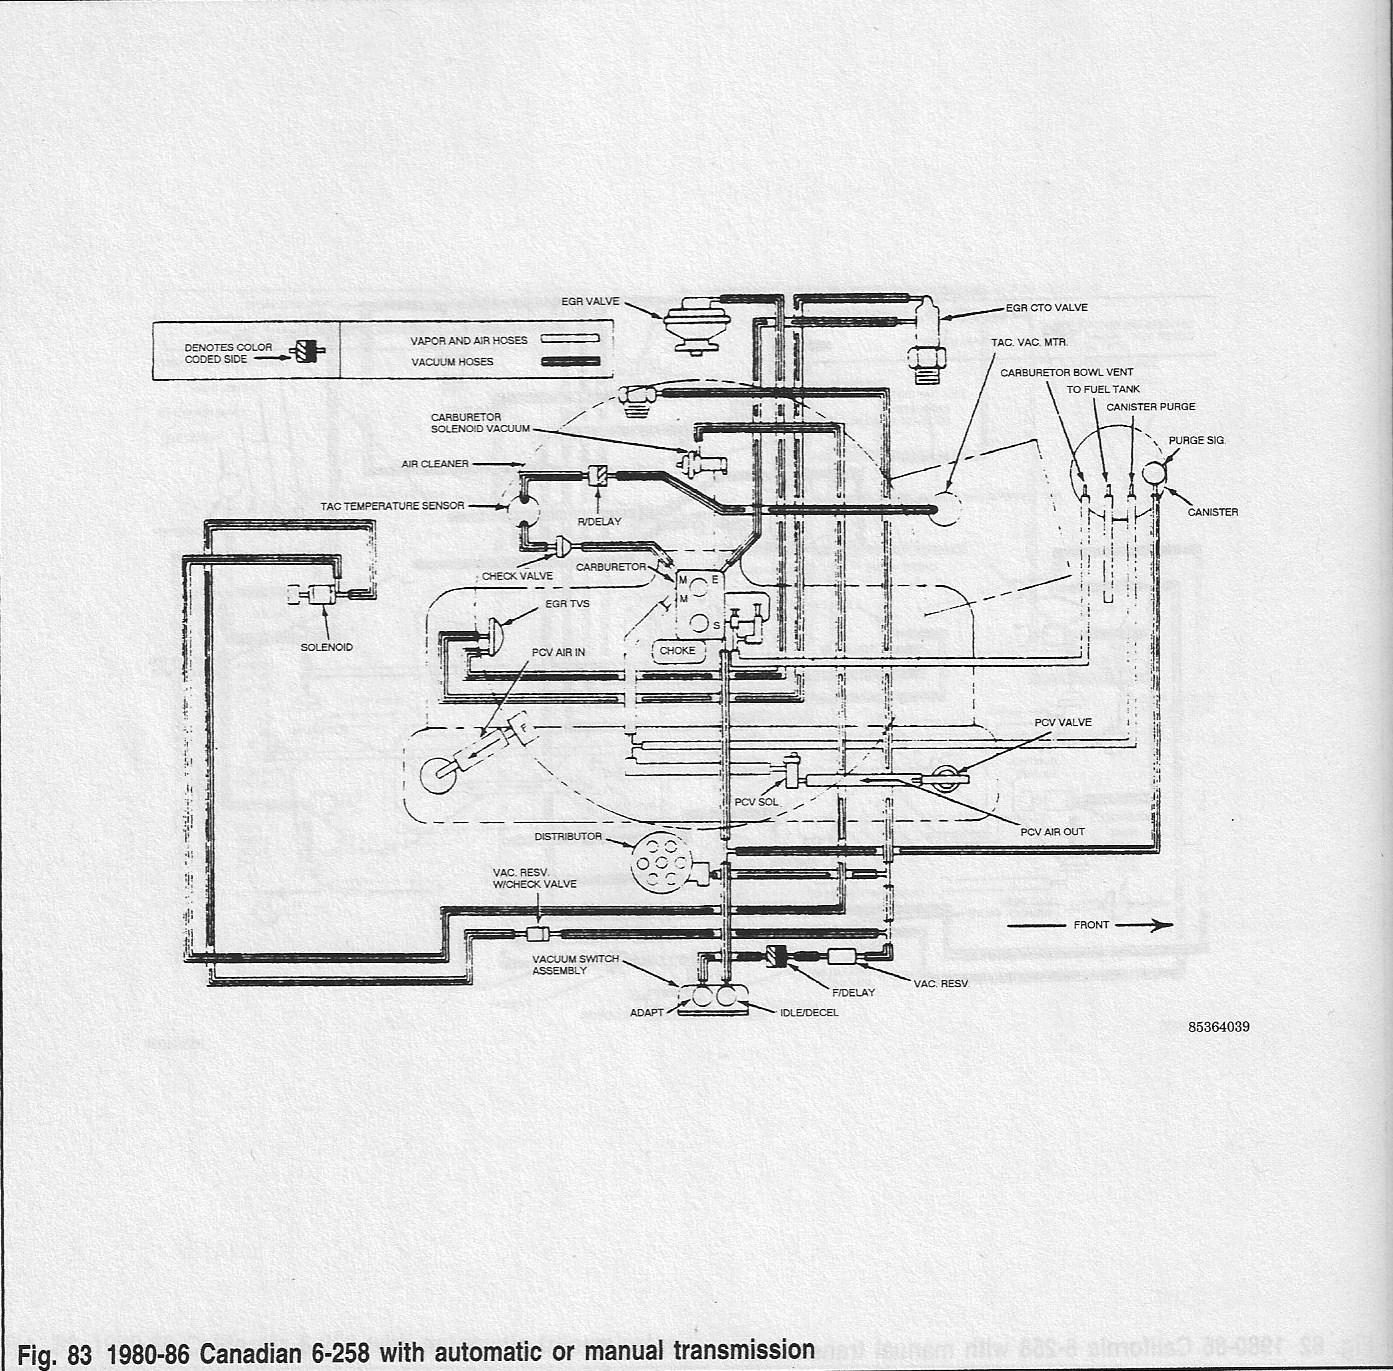 Late 80s Cto Valve Egr Purge Signal Confusion